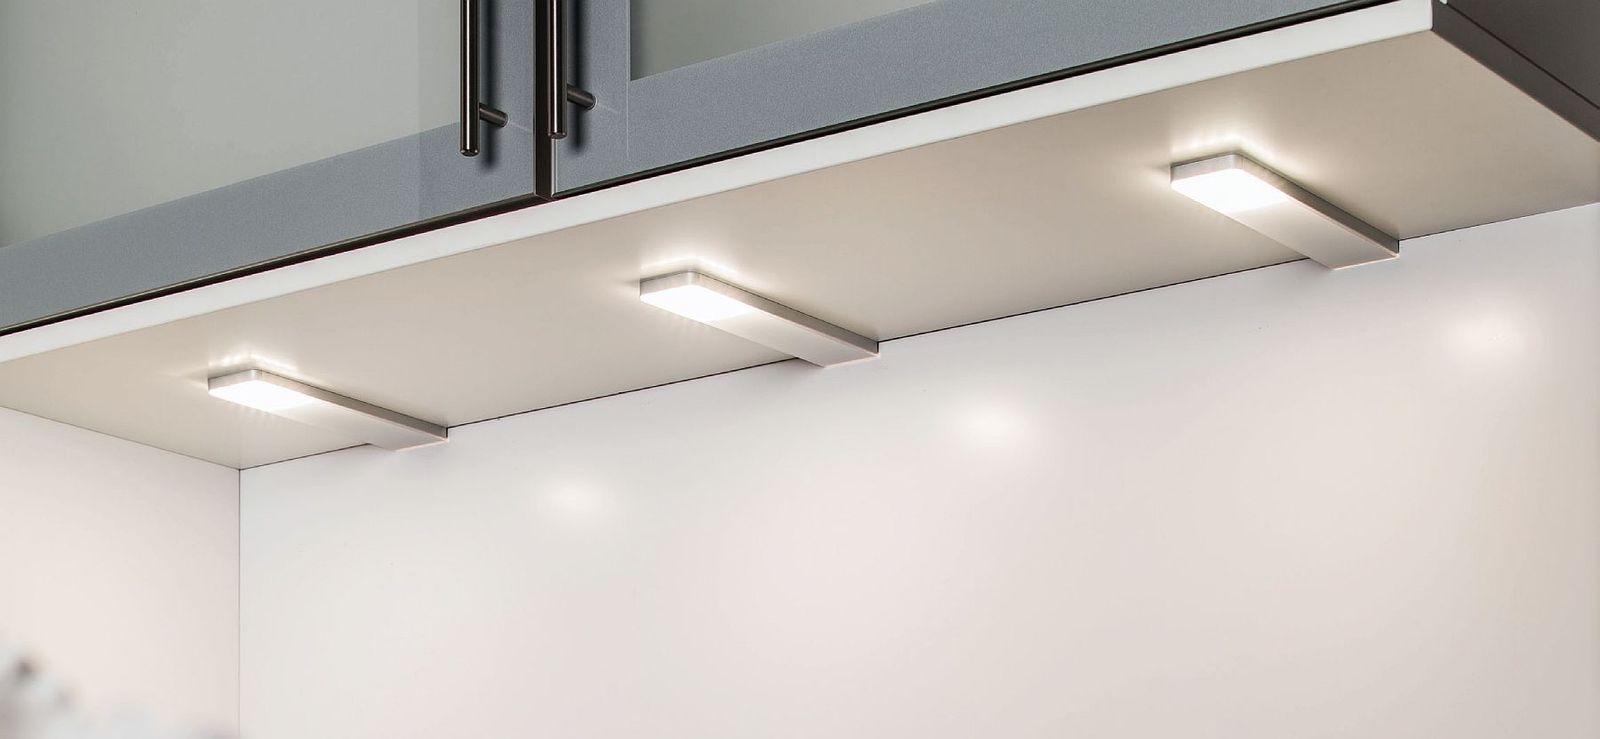 LED 2-er Unterbau Leuchten Set Küche 2 x 5 W Alu Konverter Sensor ...